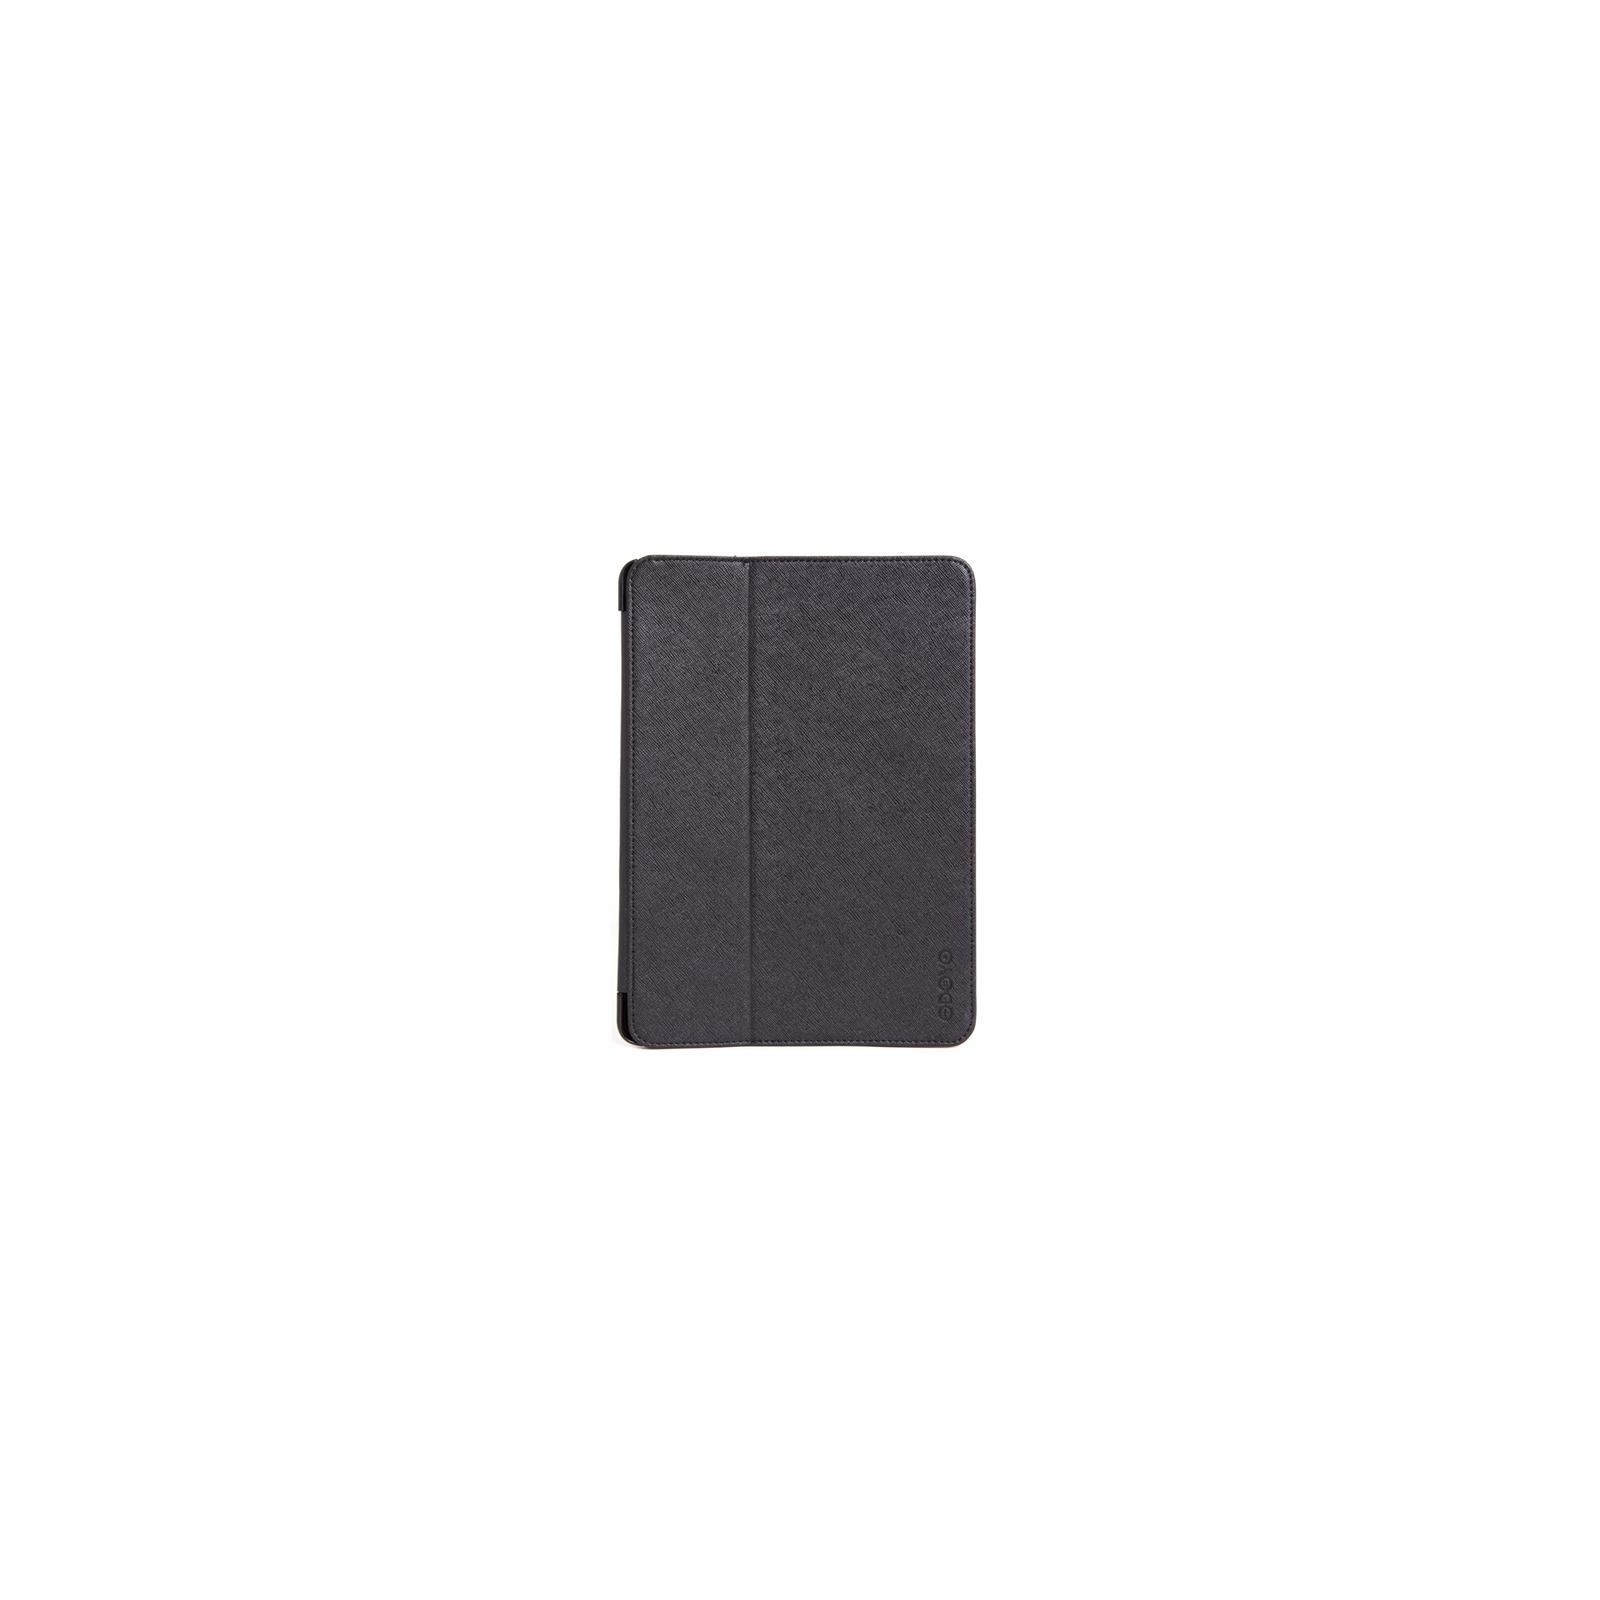 Чехол для планшета ODOYO IPAD AIR /AIRCOAT FOLIO NOIR BLACK (PA532BK)